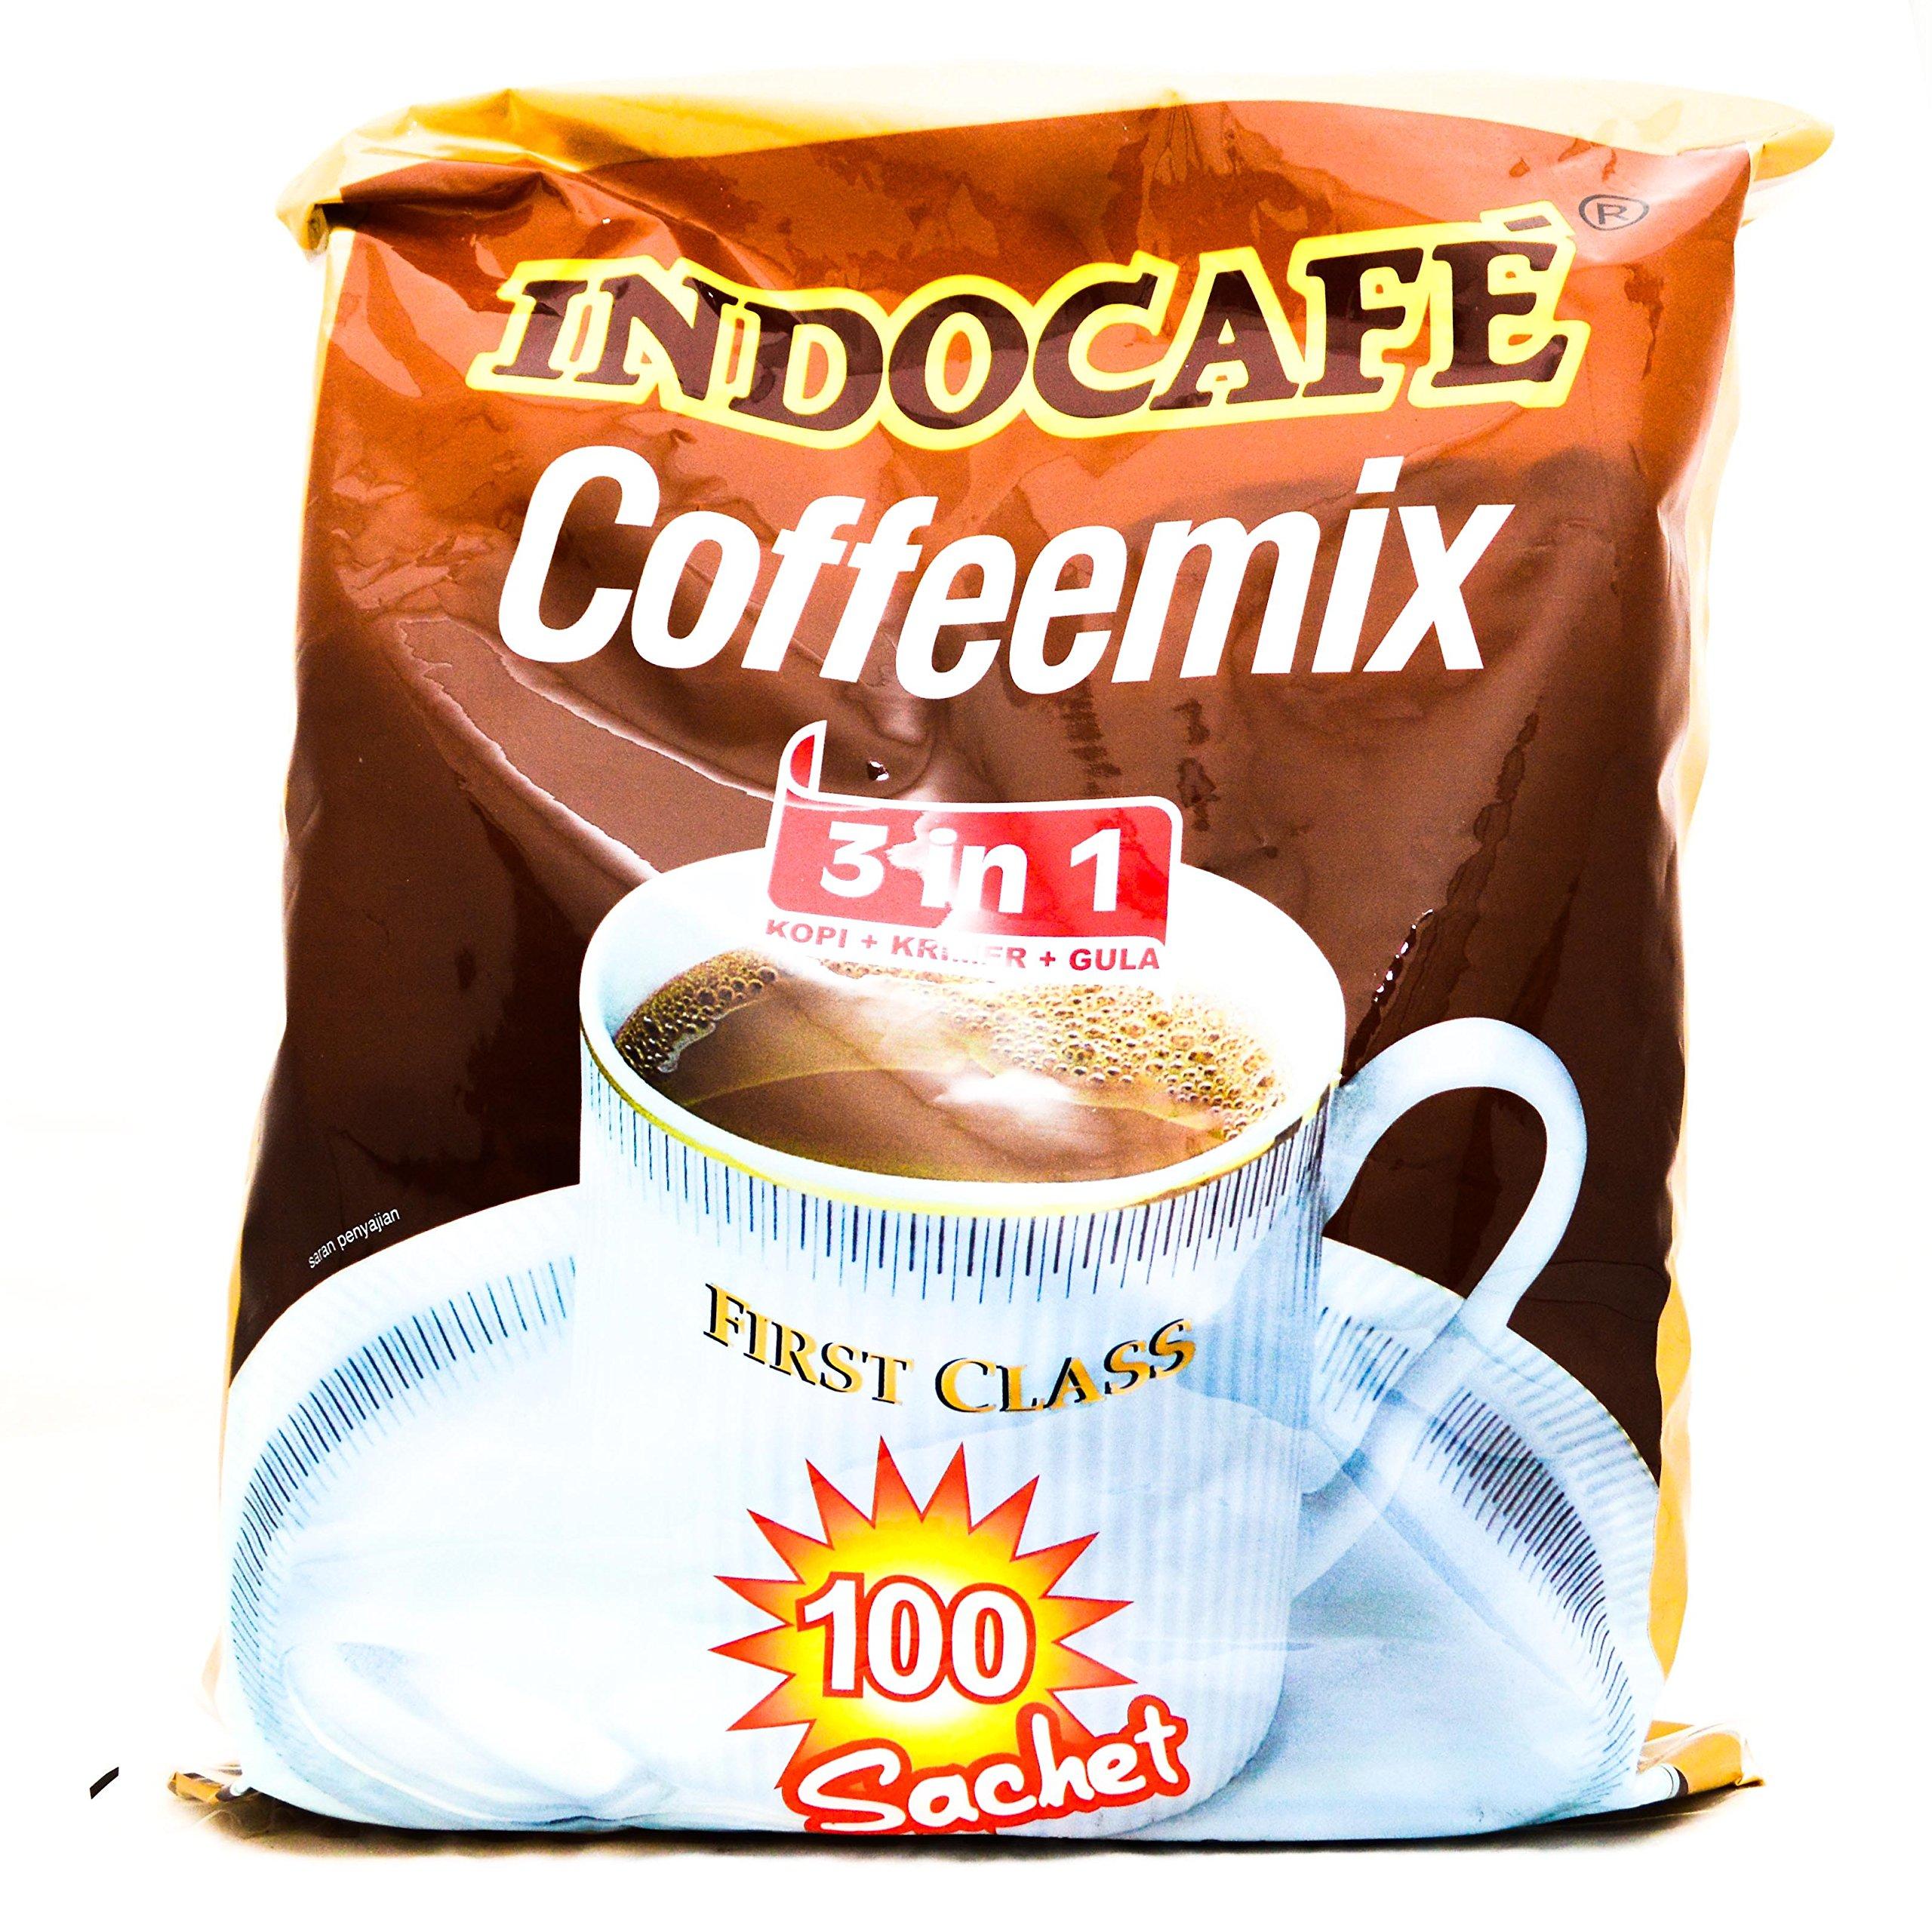 Indocafe Coffeemix 3 in 1 Coffee 2000 Gram (70.54 Oz) 100-ct @ 20 Gram